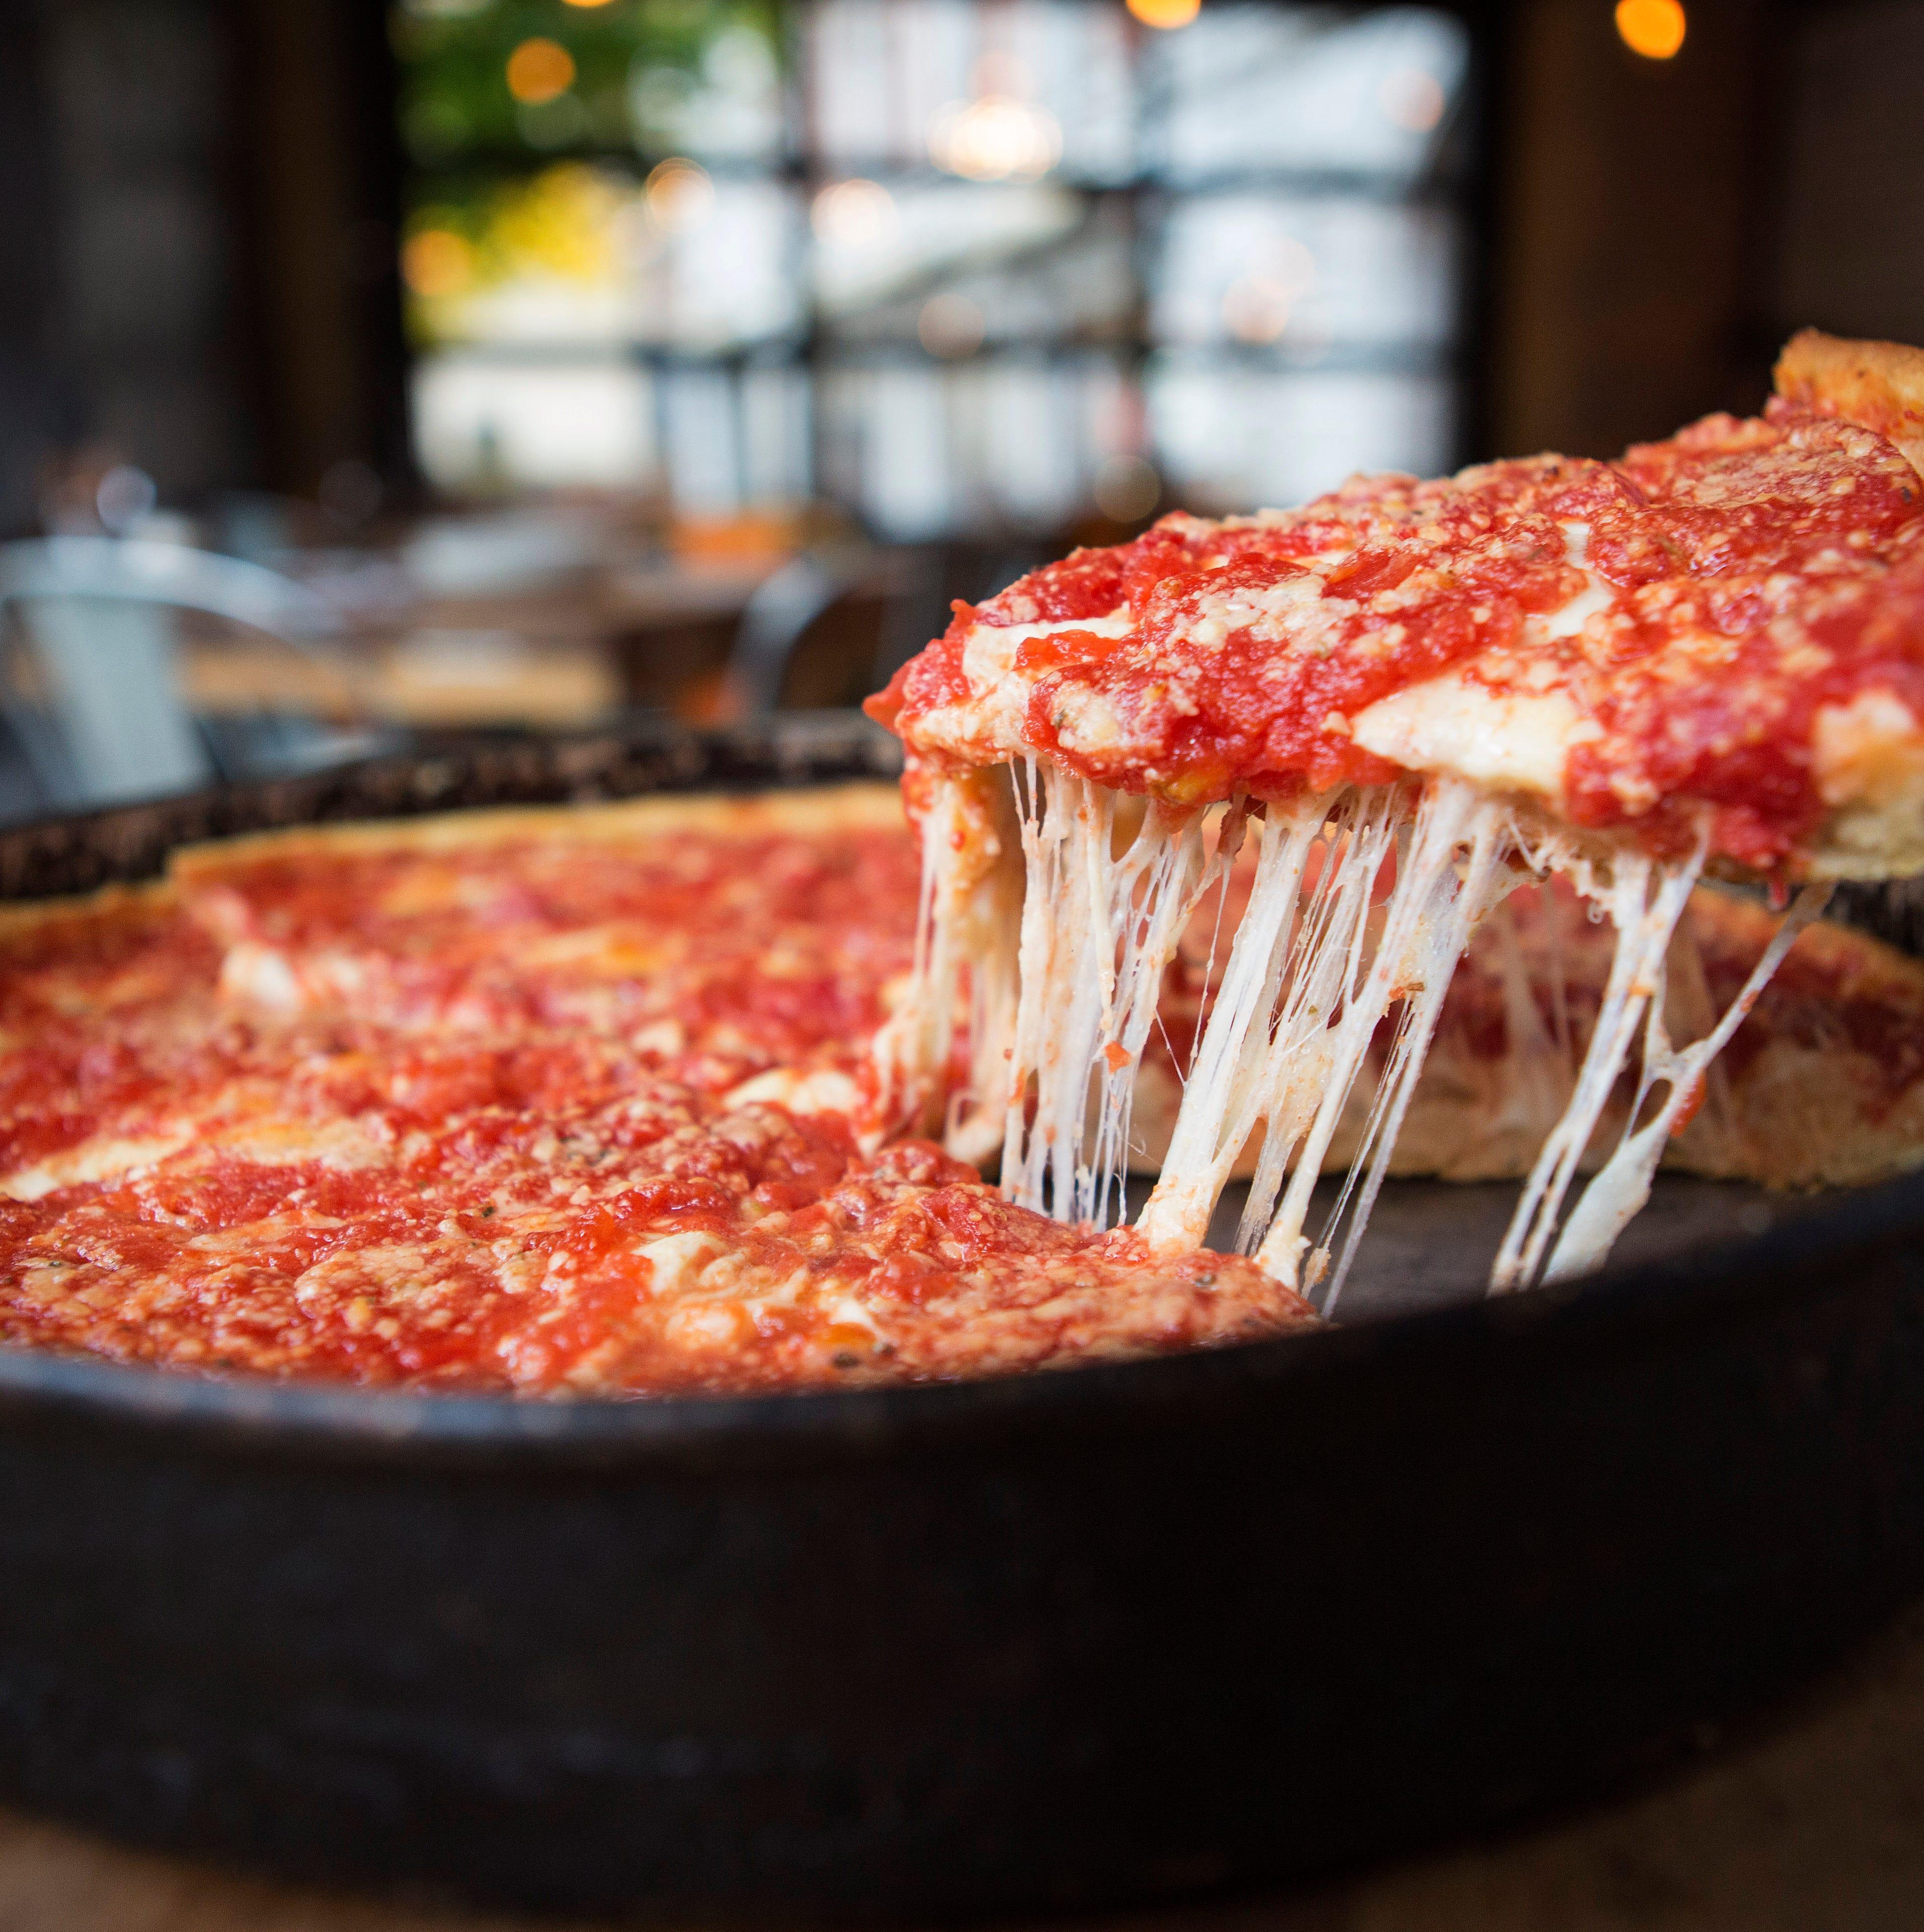 Lou Malnati's Pizzeria opens in Scottsdale on Sept. 11